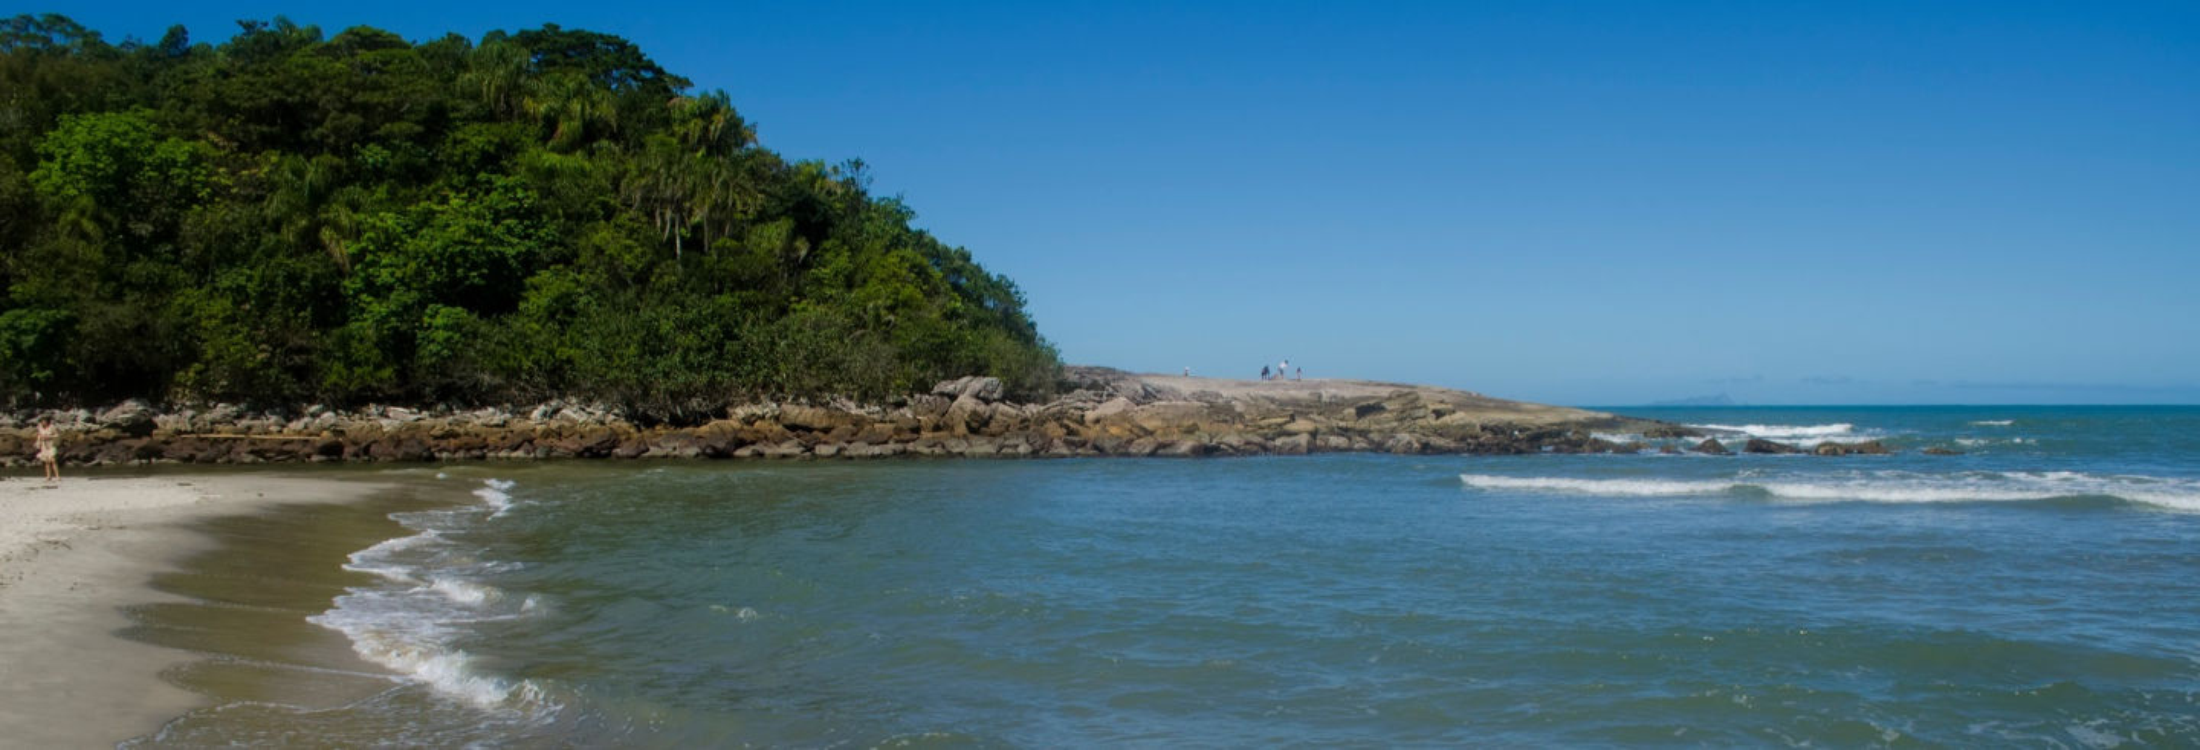 Excursión privada a las playas de São Sebastião